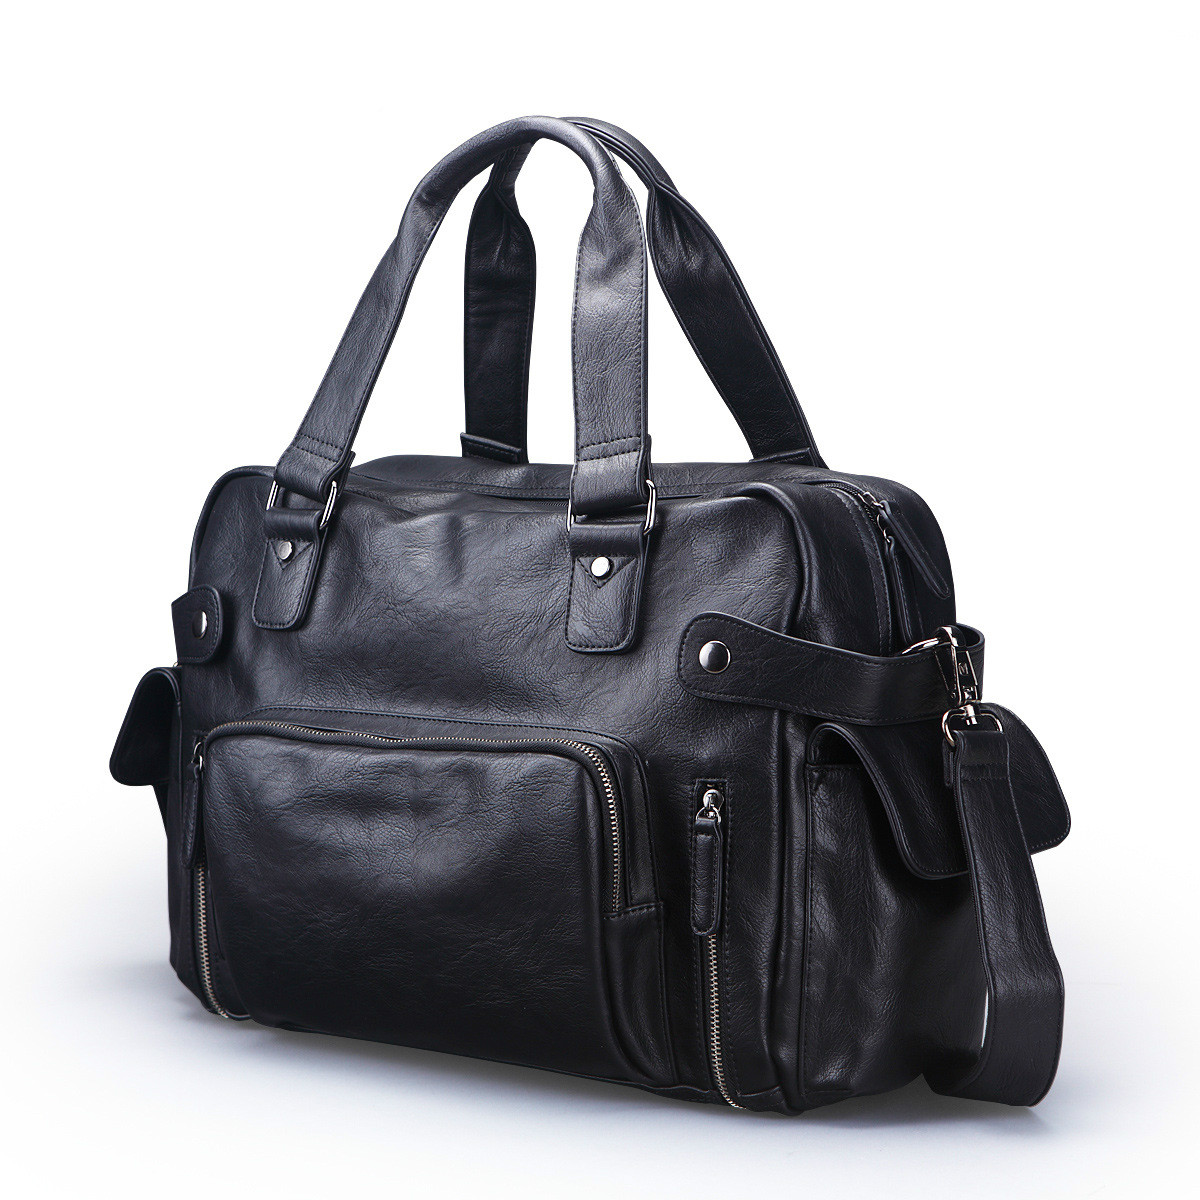 2019 Men Leather Bag Business Men Bags Laptop Tote Briefcases Crossbody Bags Shoulder Handbag Mens Messenger Bag 91032019 Men Leather Bag Business Men Bags Laptop Tote Briefcases Crossbody Bags Shoulder Handbag Mens Messenger Bag 9103